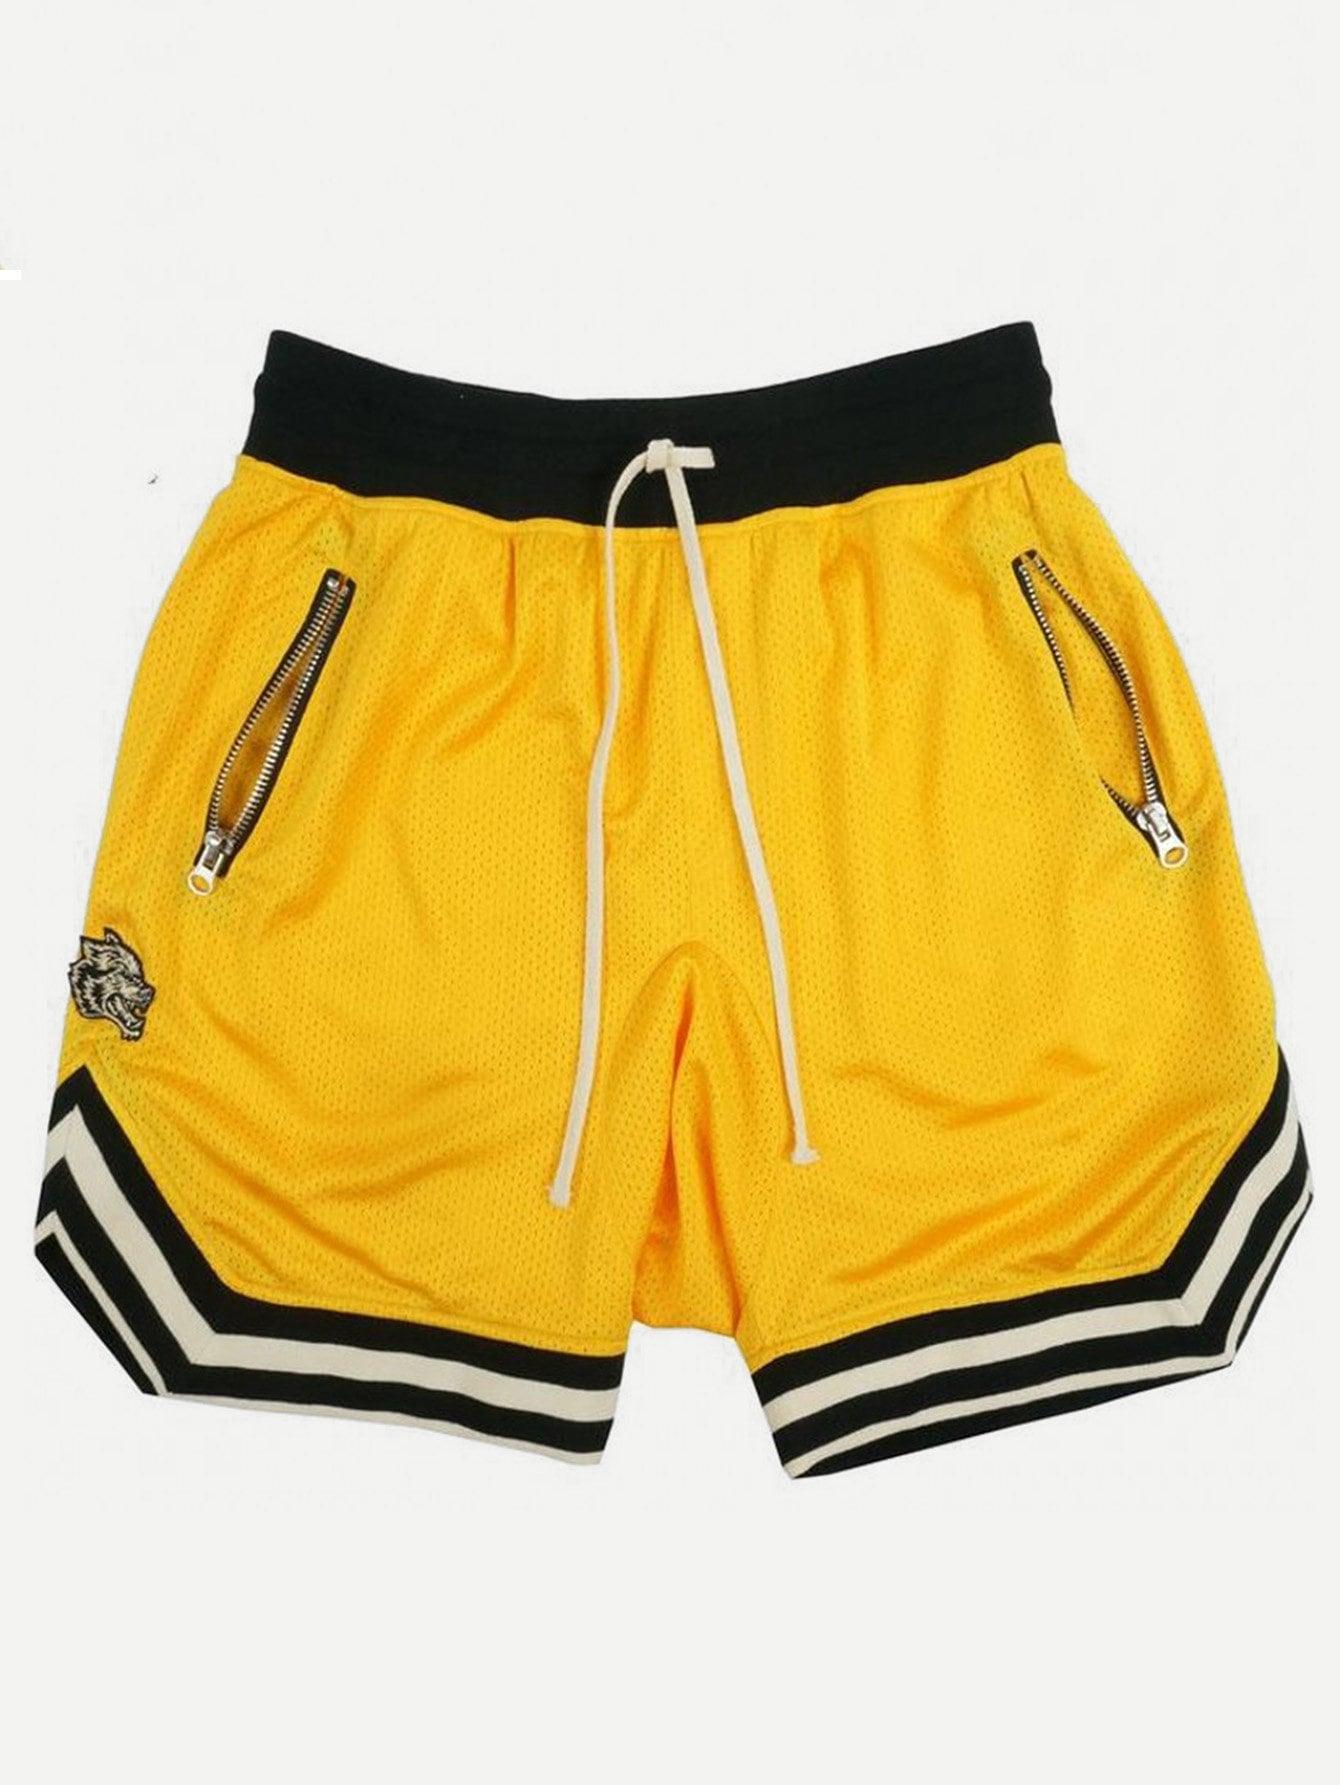 Men Striped Trim Drawstring Waist Shorts men colorful striped drawstring shorts